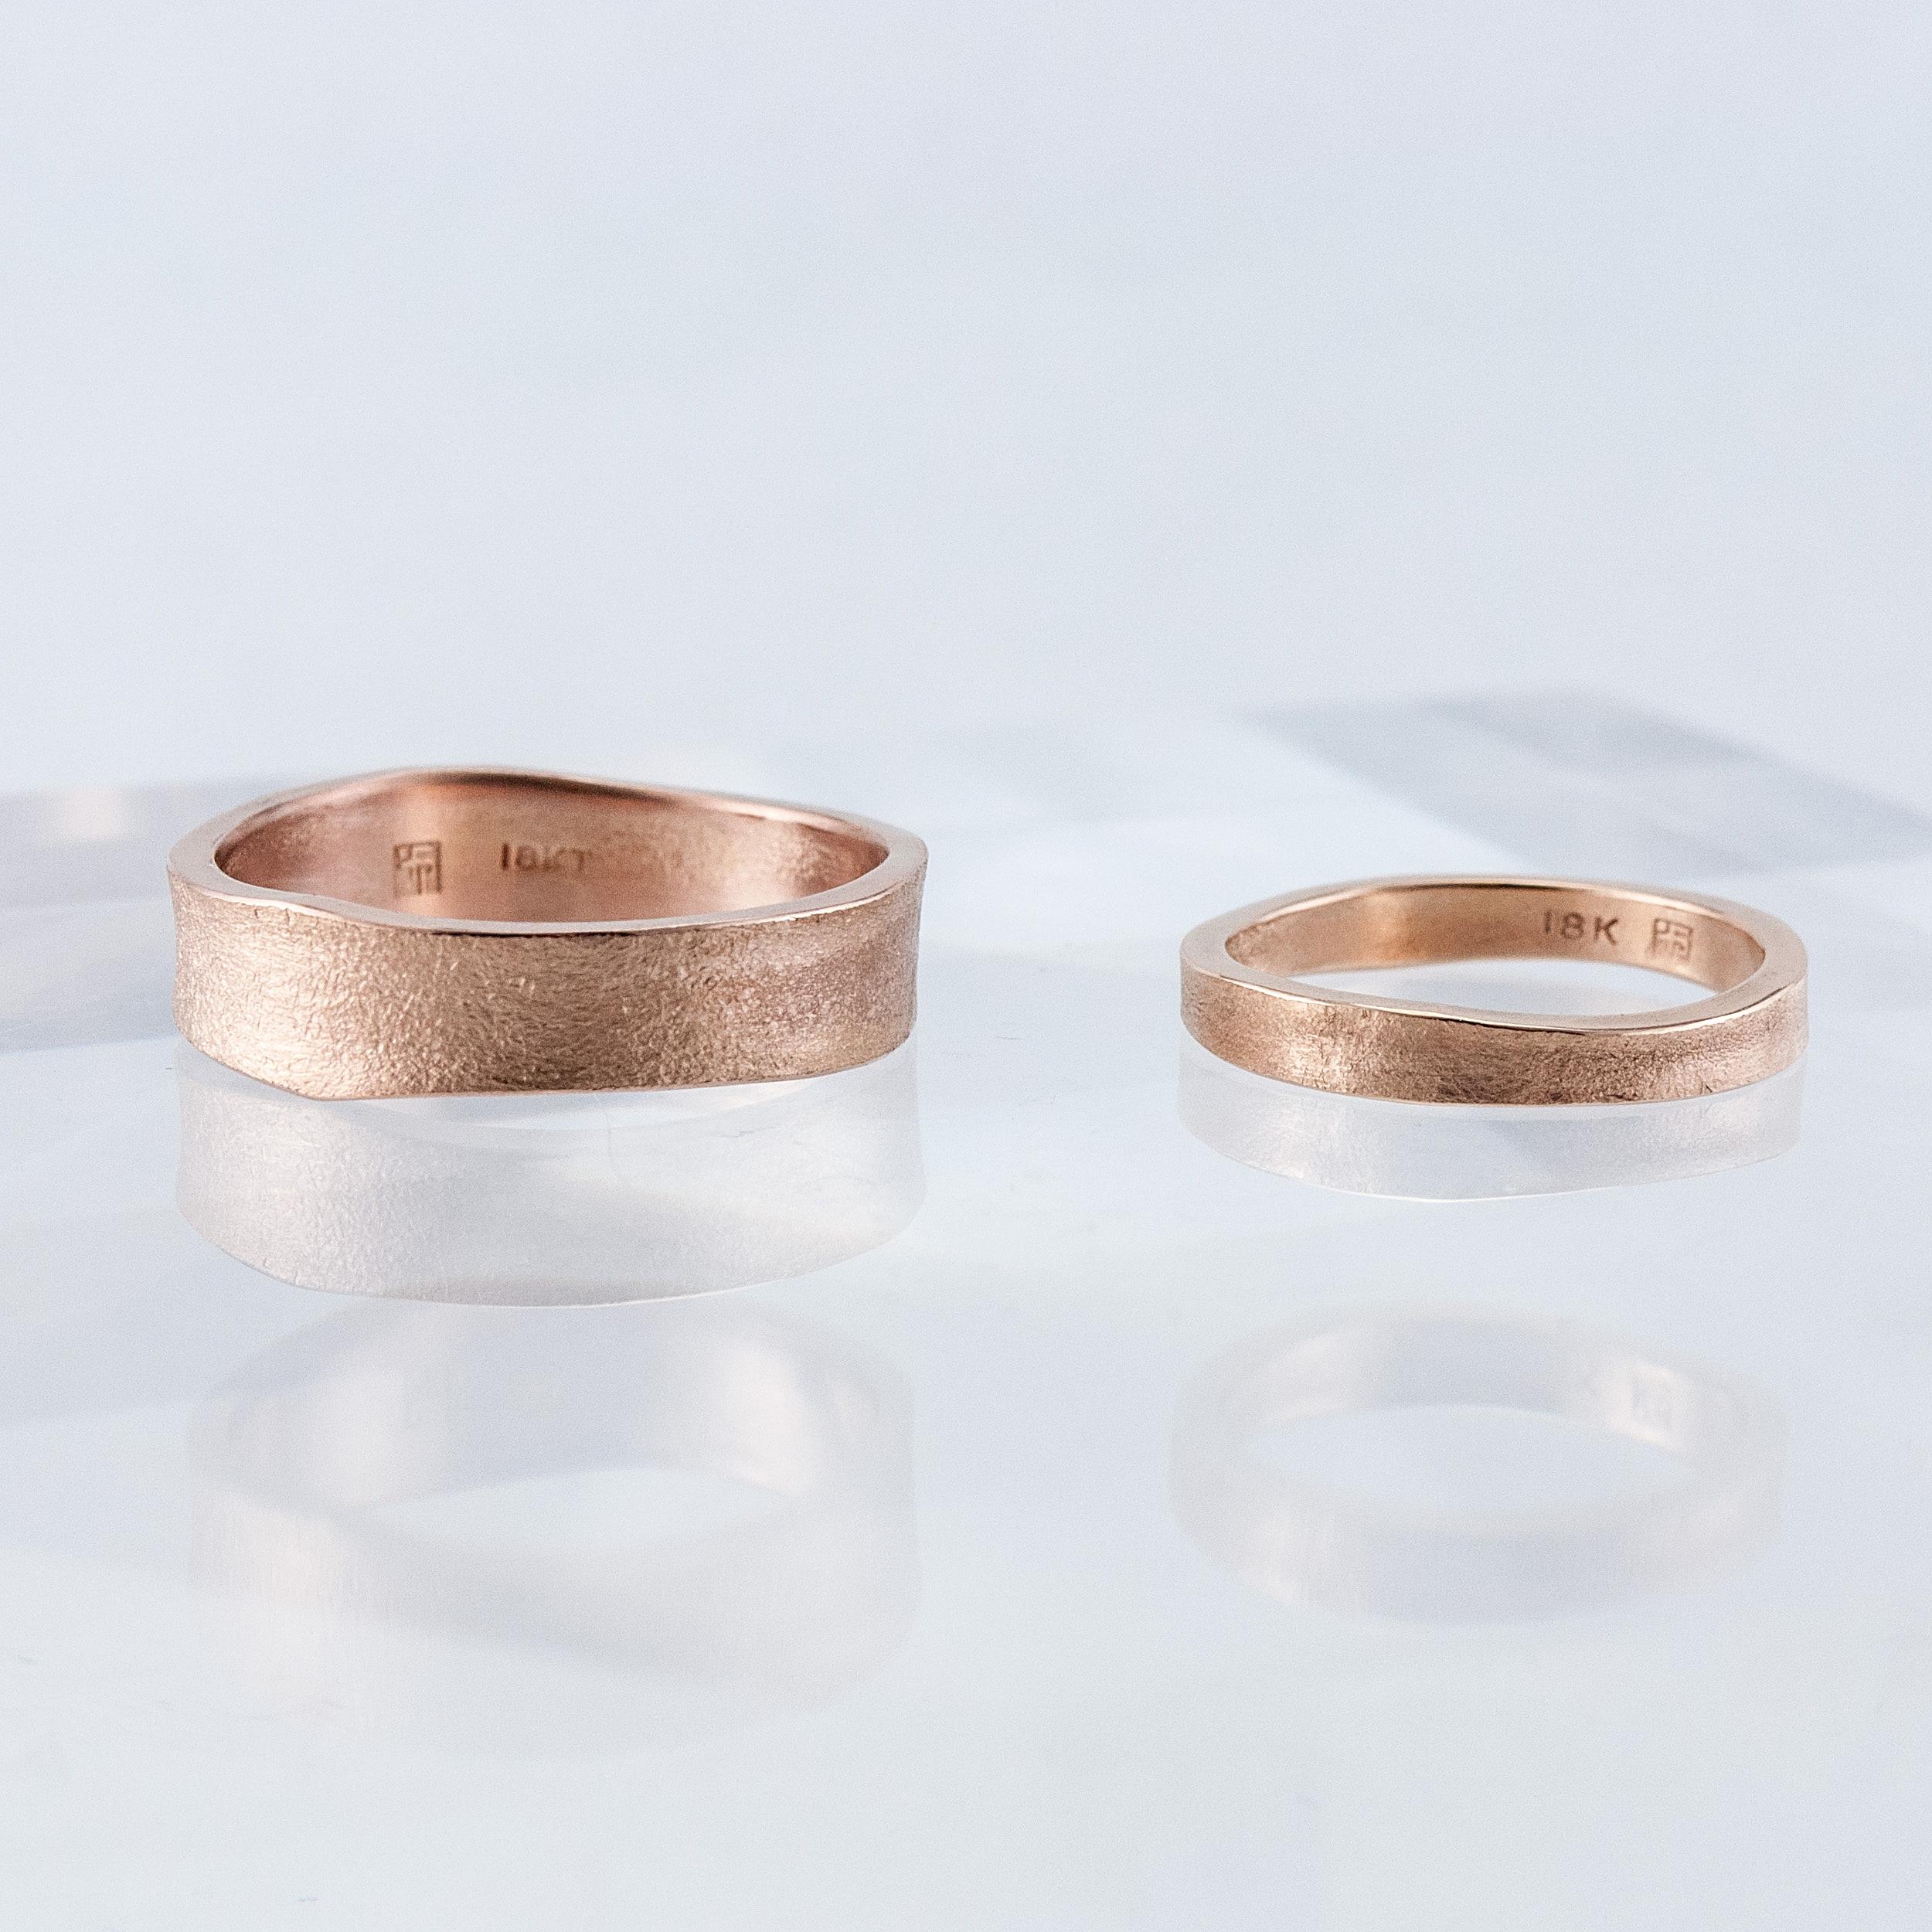 Pair of Rose Gold Desert Bands